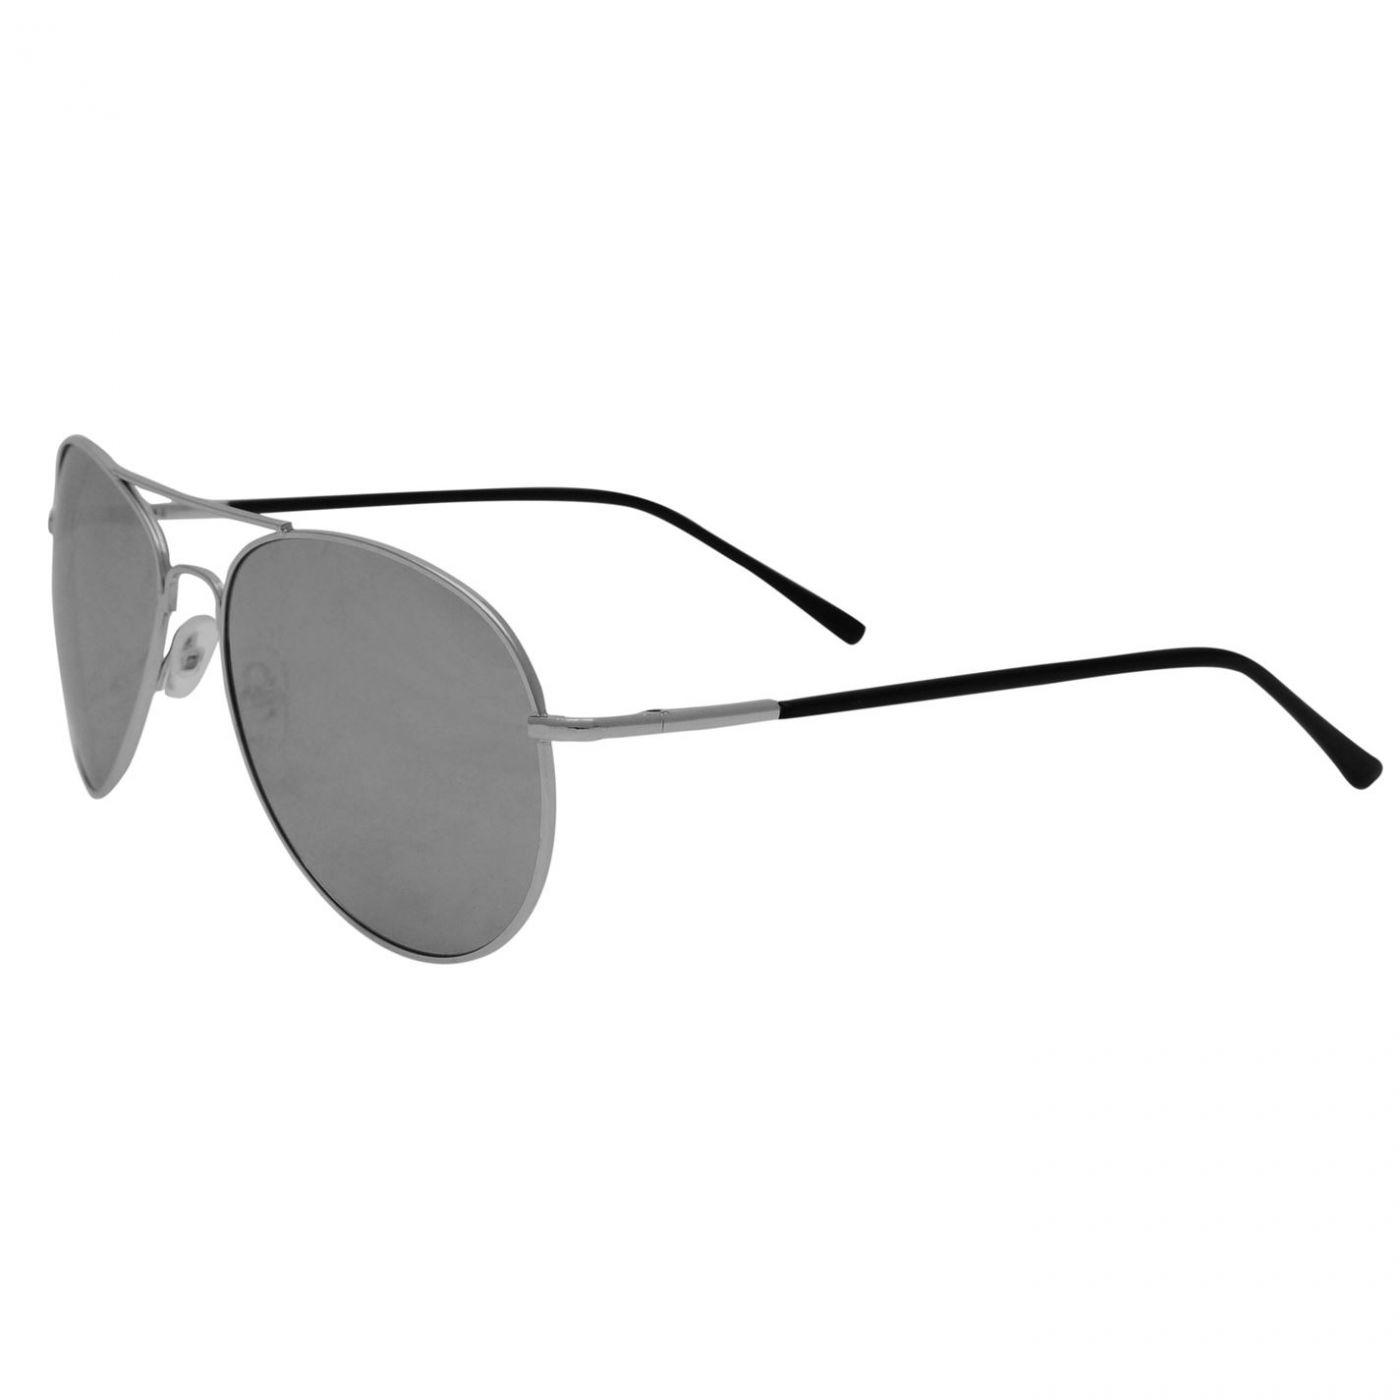 Pulp Aviator Sunglasses Mens